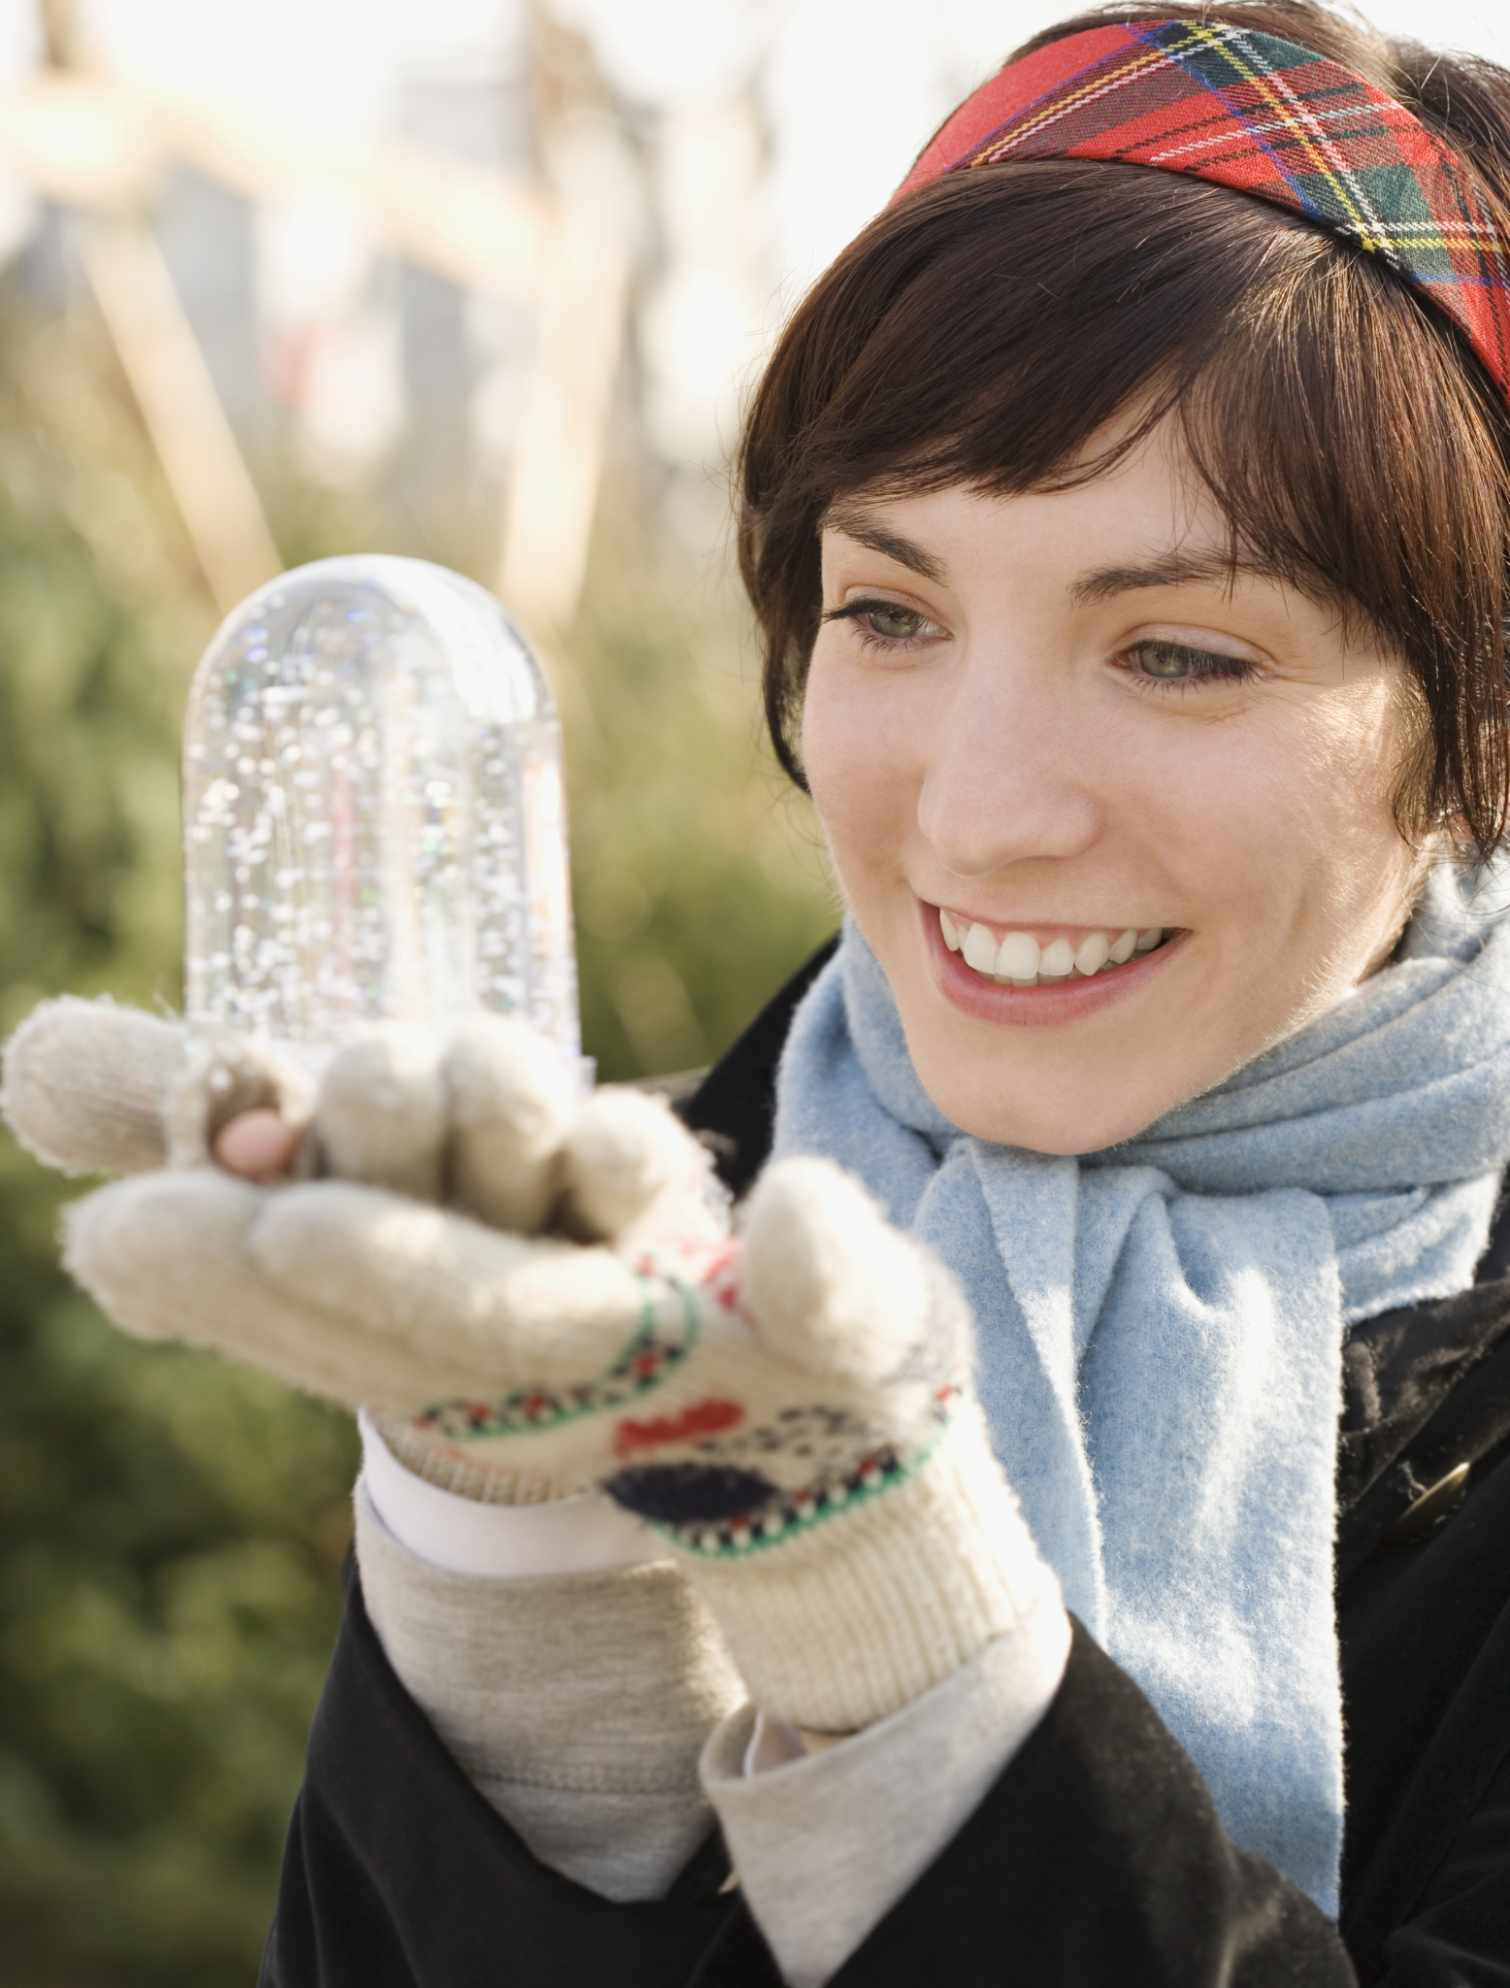 7 winter formal asking ideas